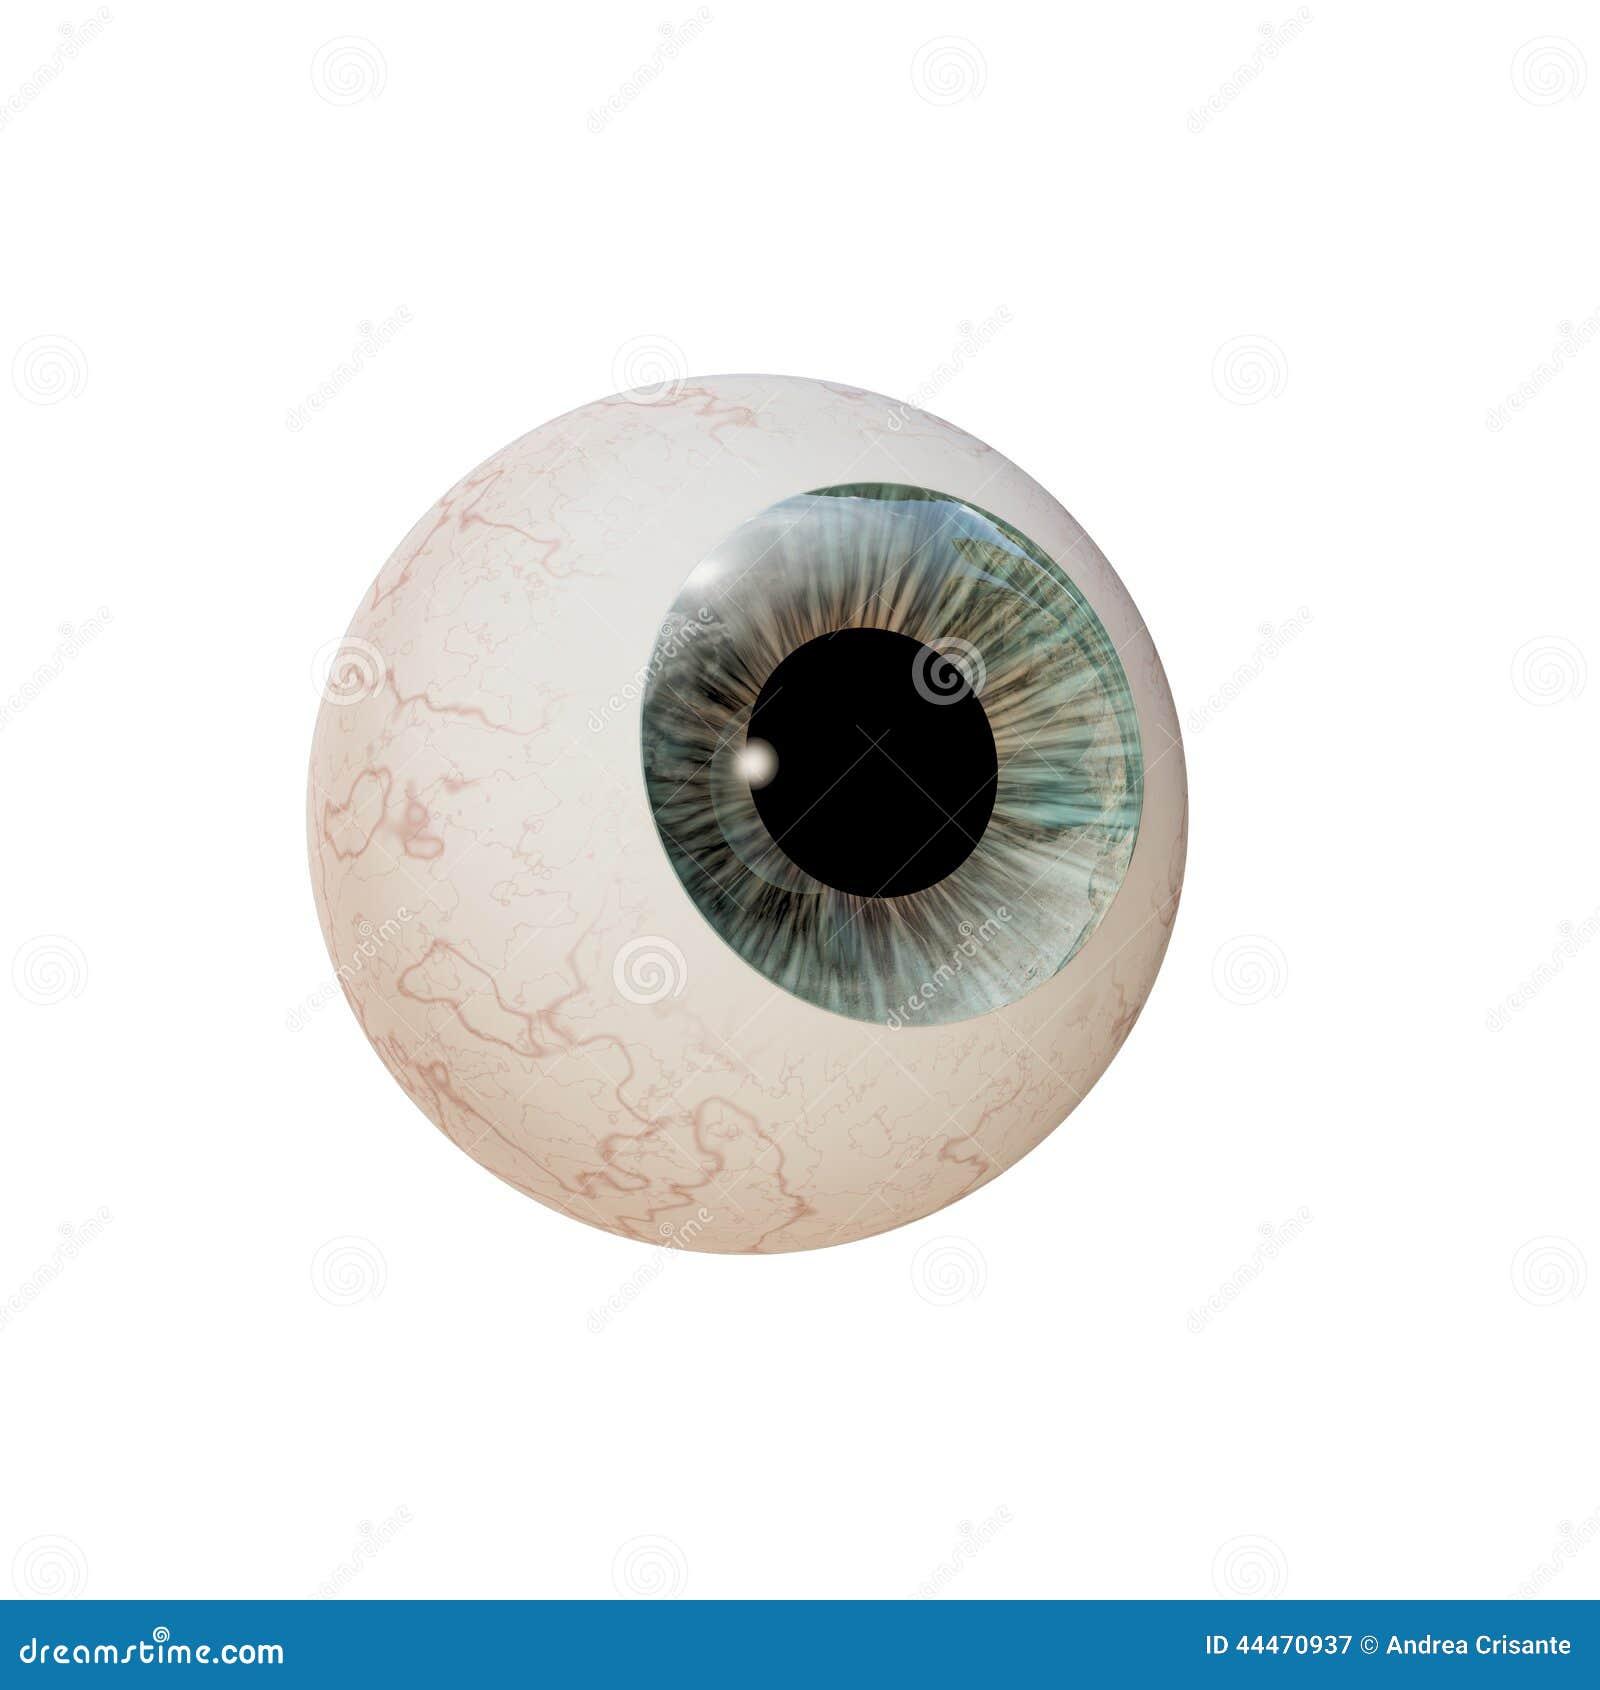 Augapfel stock abbildung. Illustration von anatomie, retina - 44470937